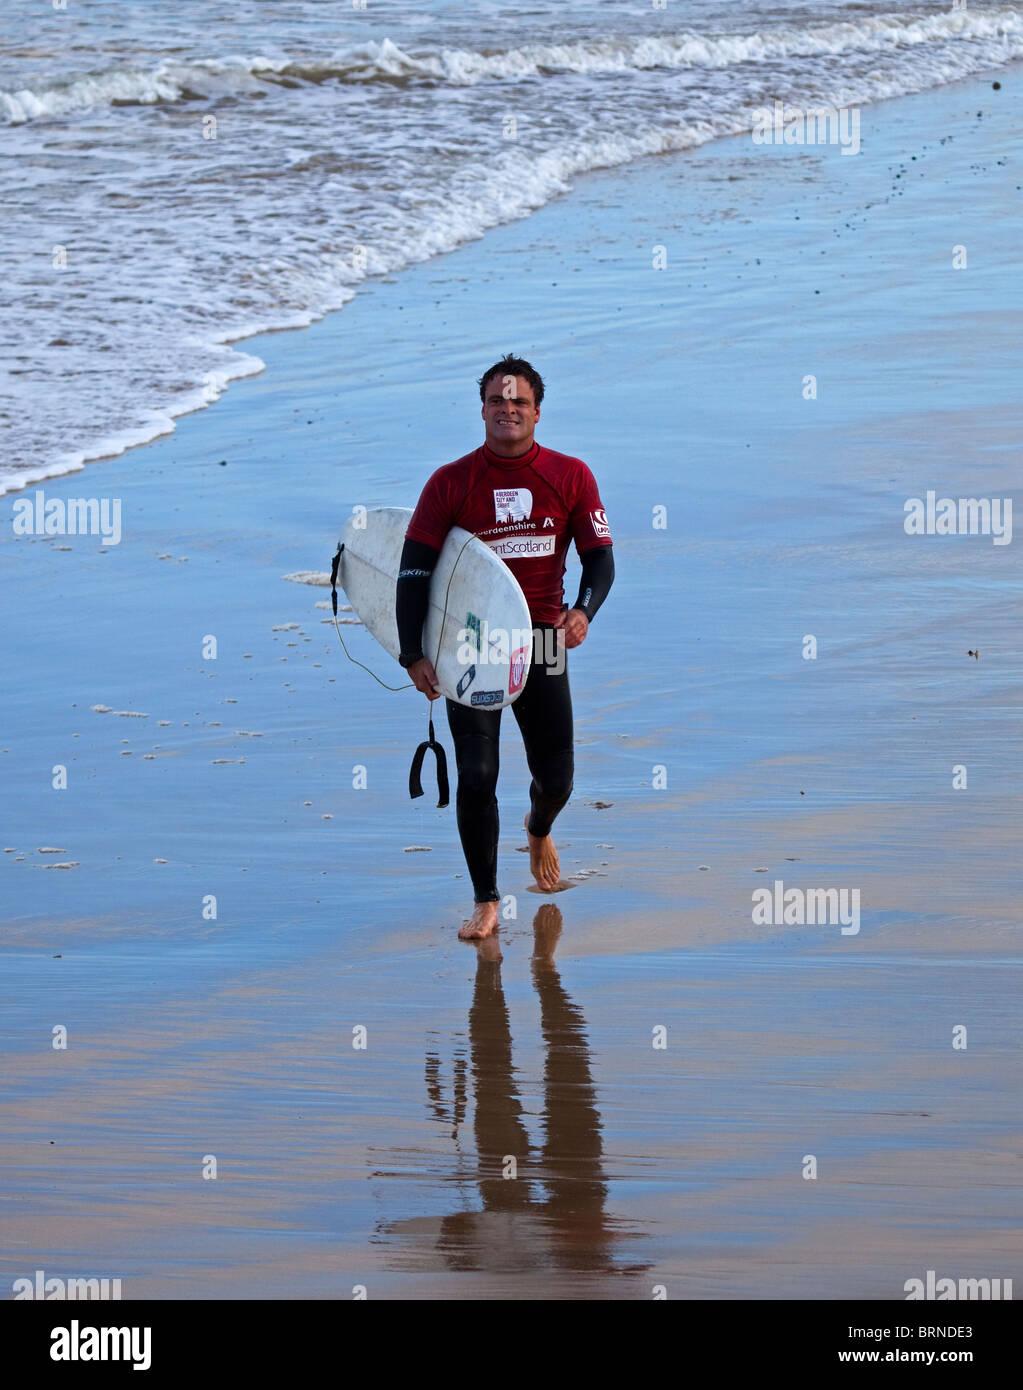 Russell Winter, elite surfer, Fraserburgh, Scotland, UK, Europe - Stock Image